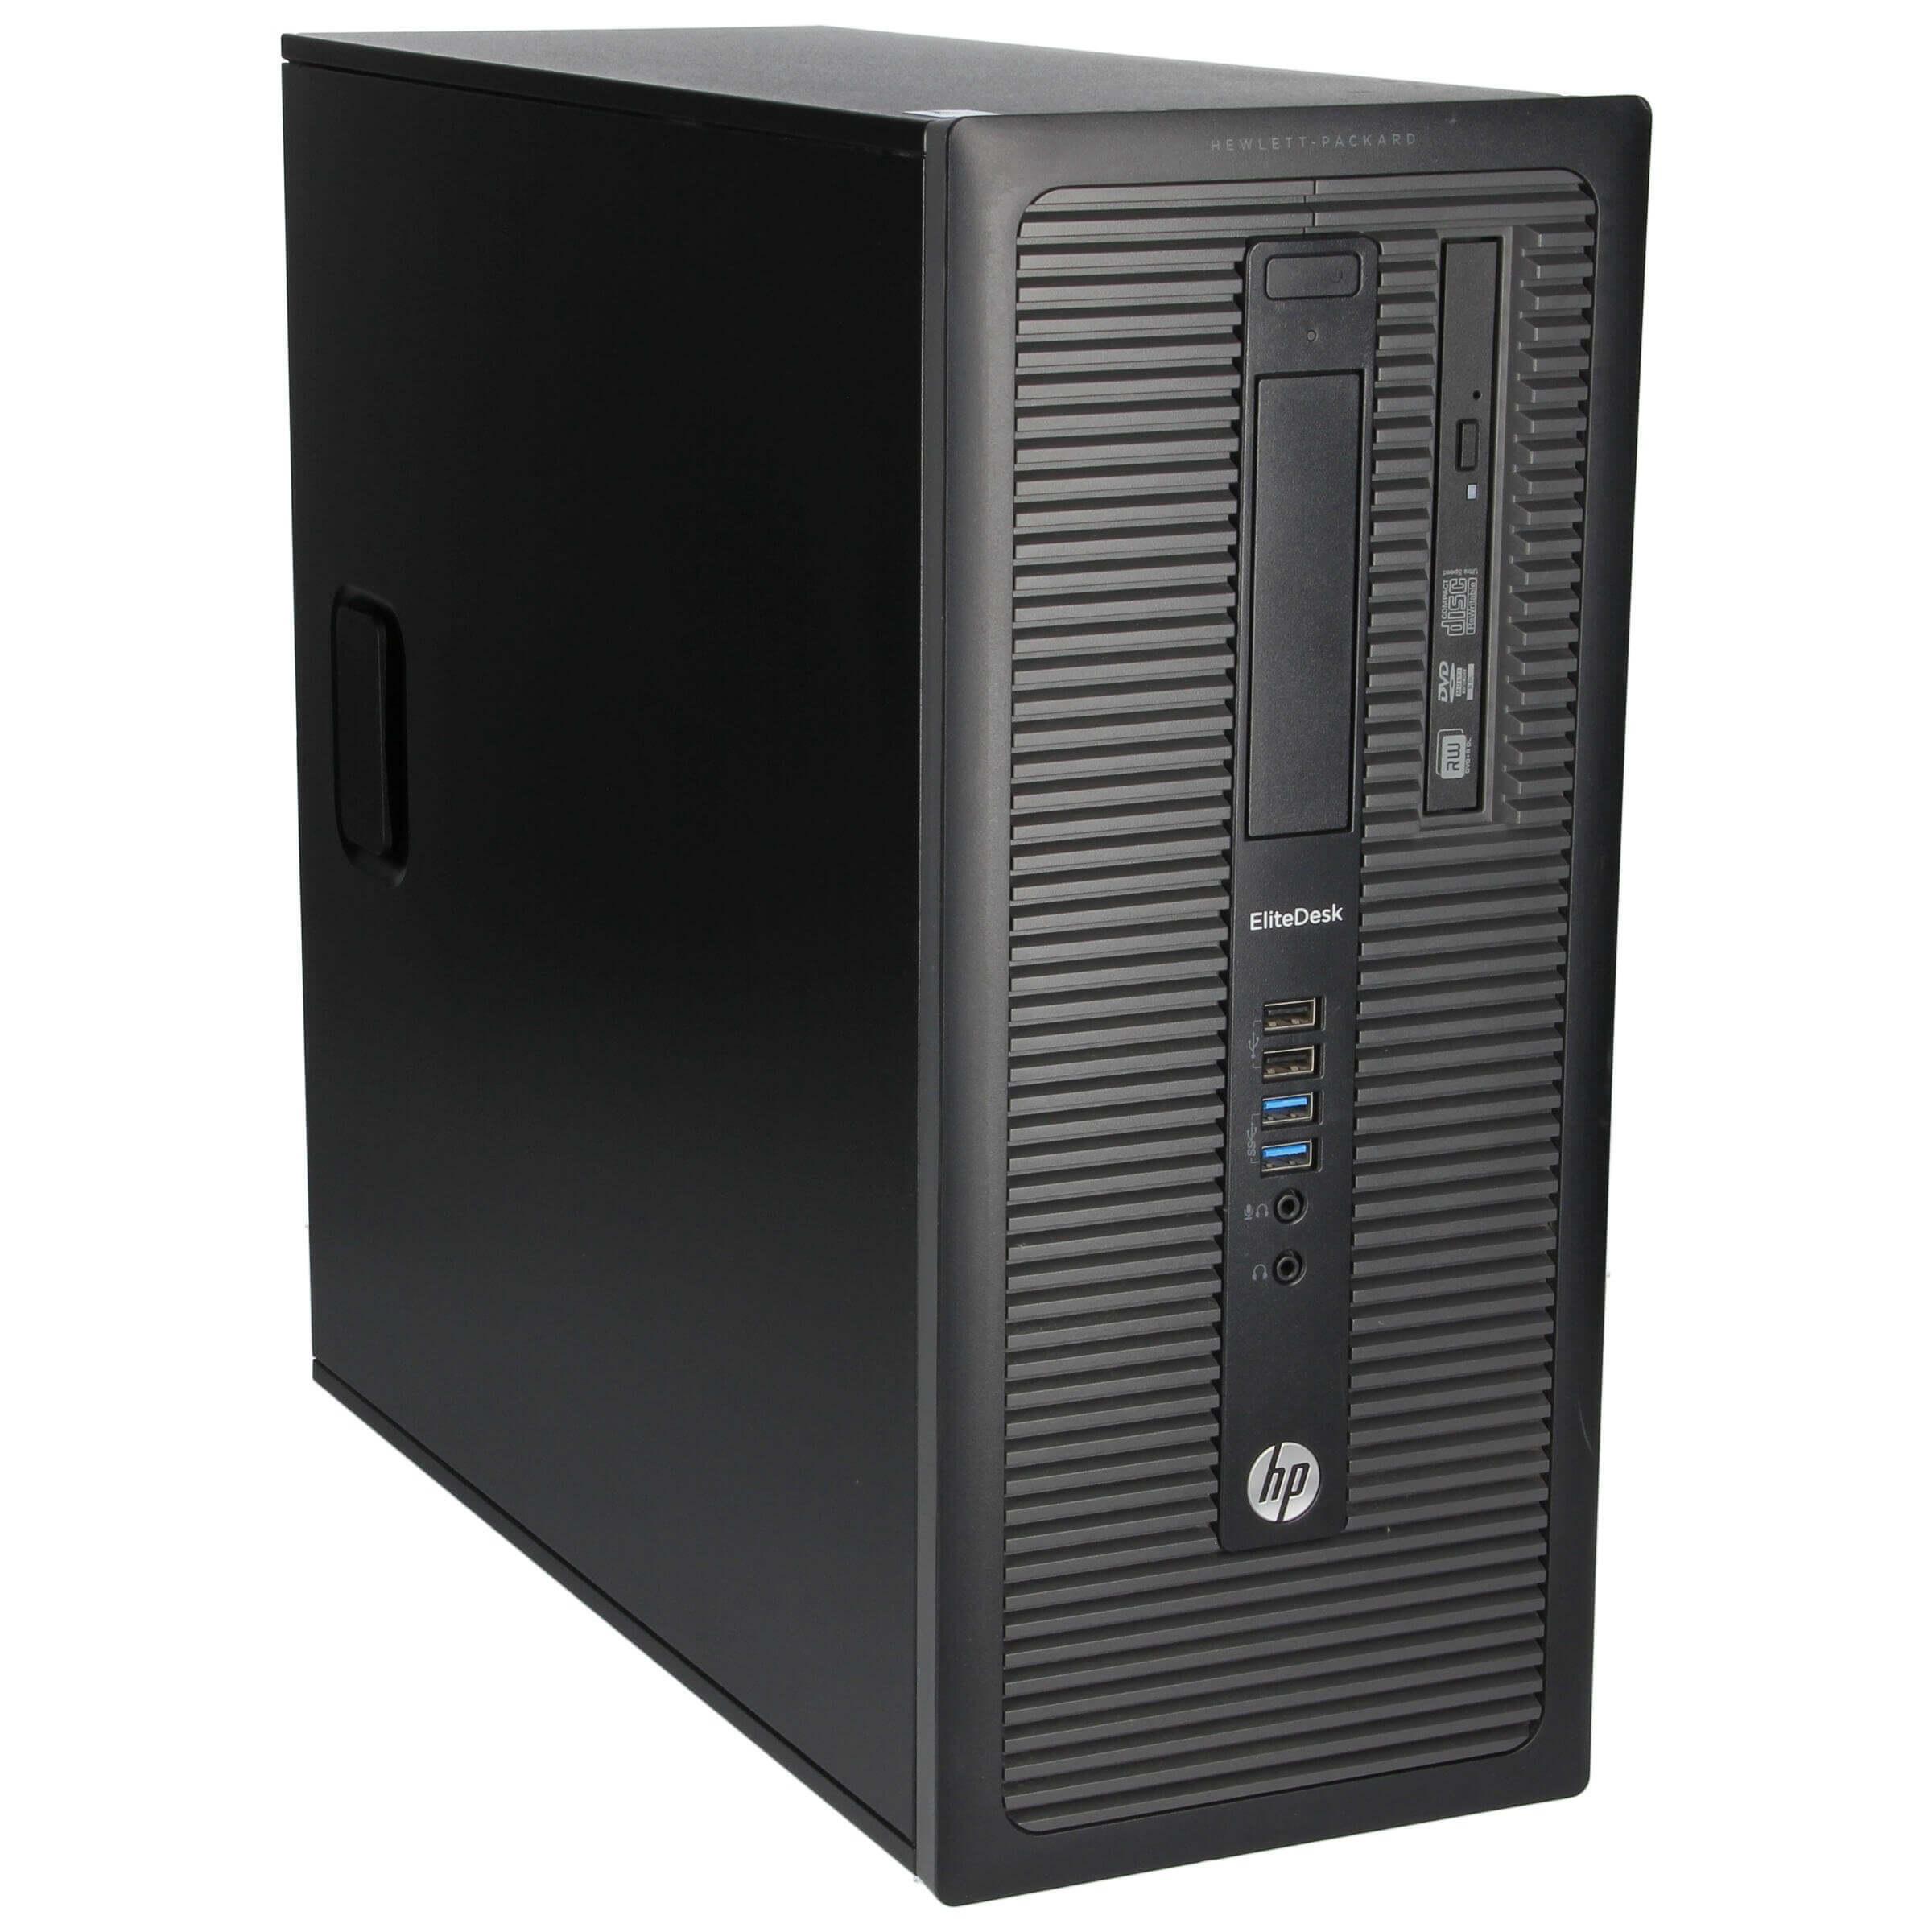 HP ELITEDESK 800 G1 TOWER I5-4590 3.3 / 8192 MB DDR3 / 256 GB SSD + 500 GB / DVD-RW / WINDOWS 10 PRO